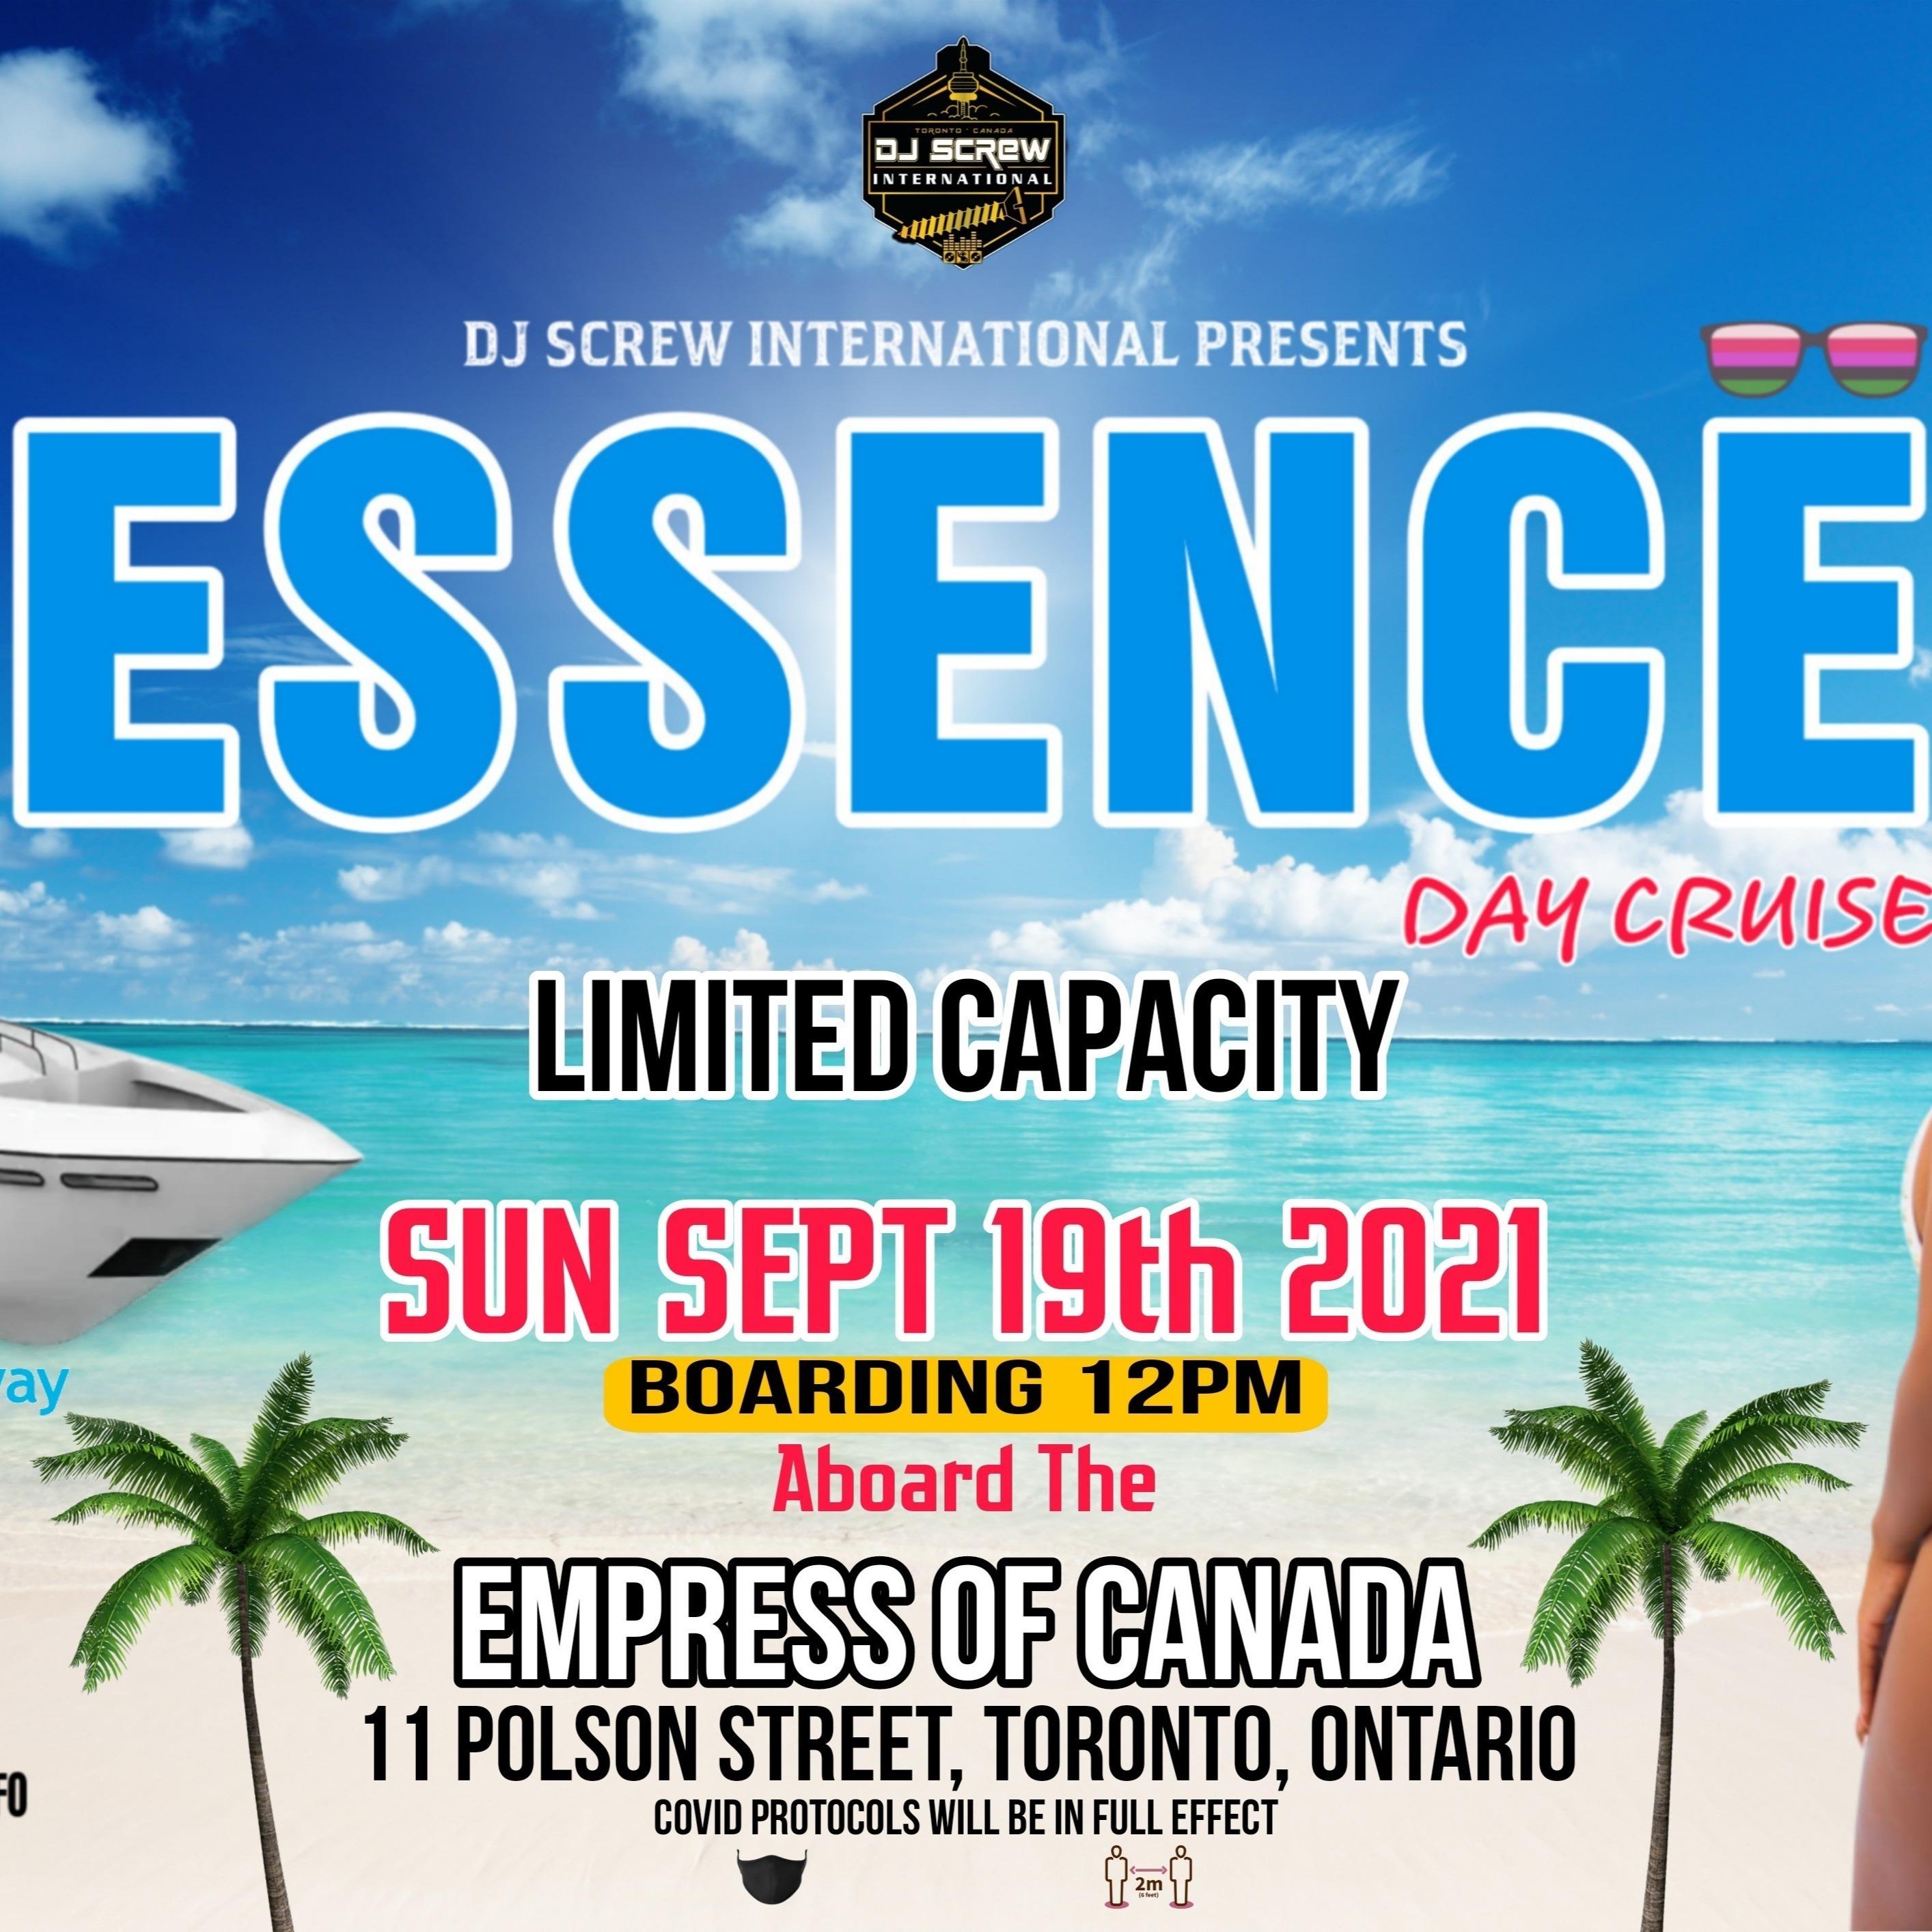 Essence - Day Cruise